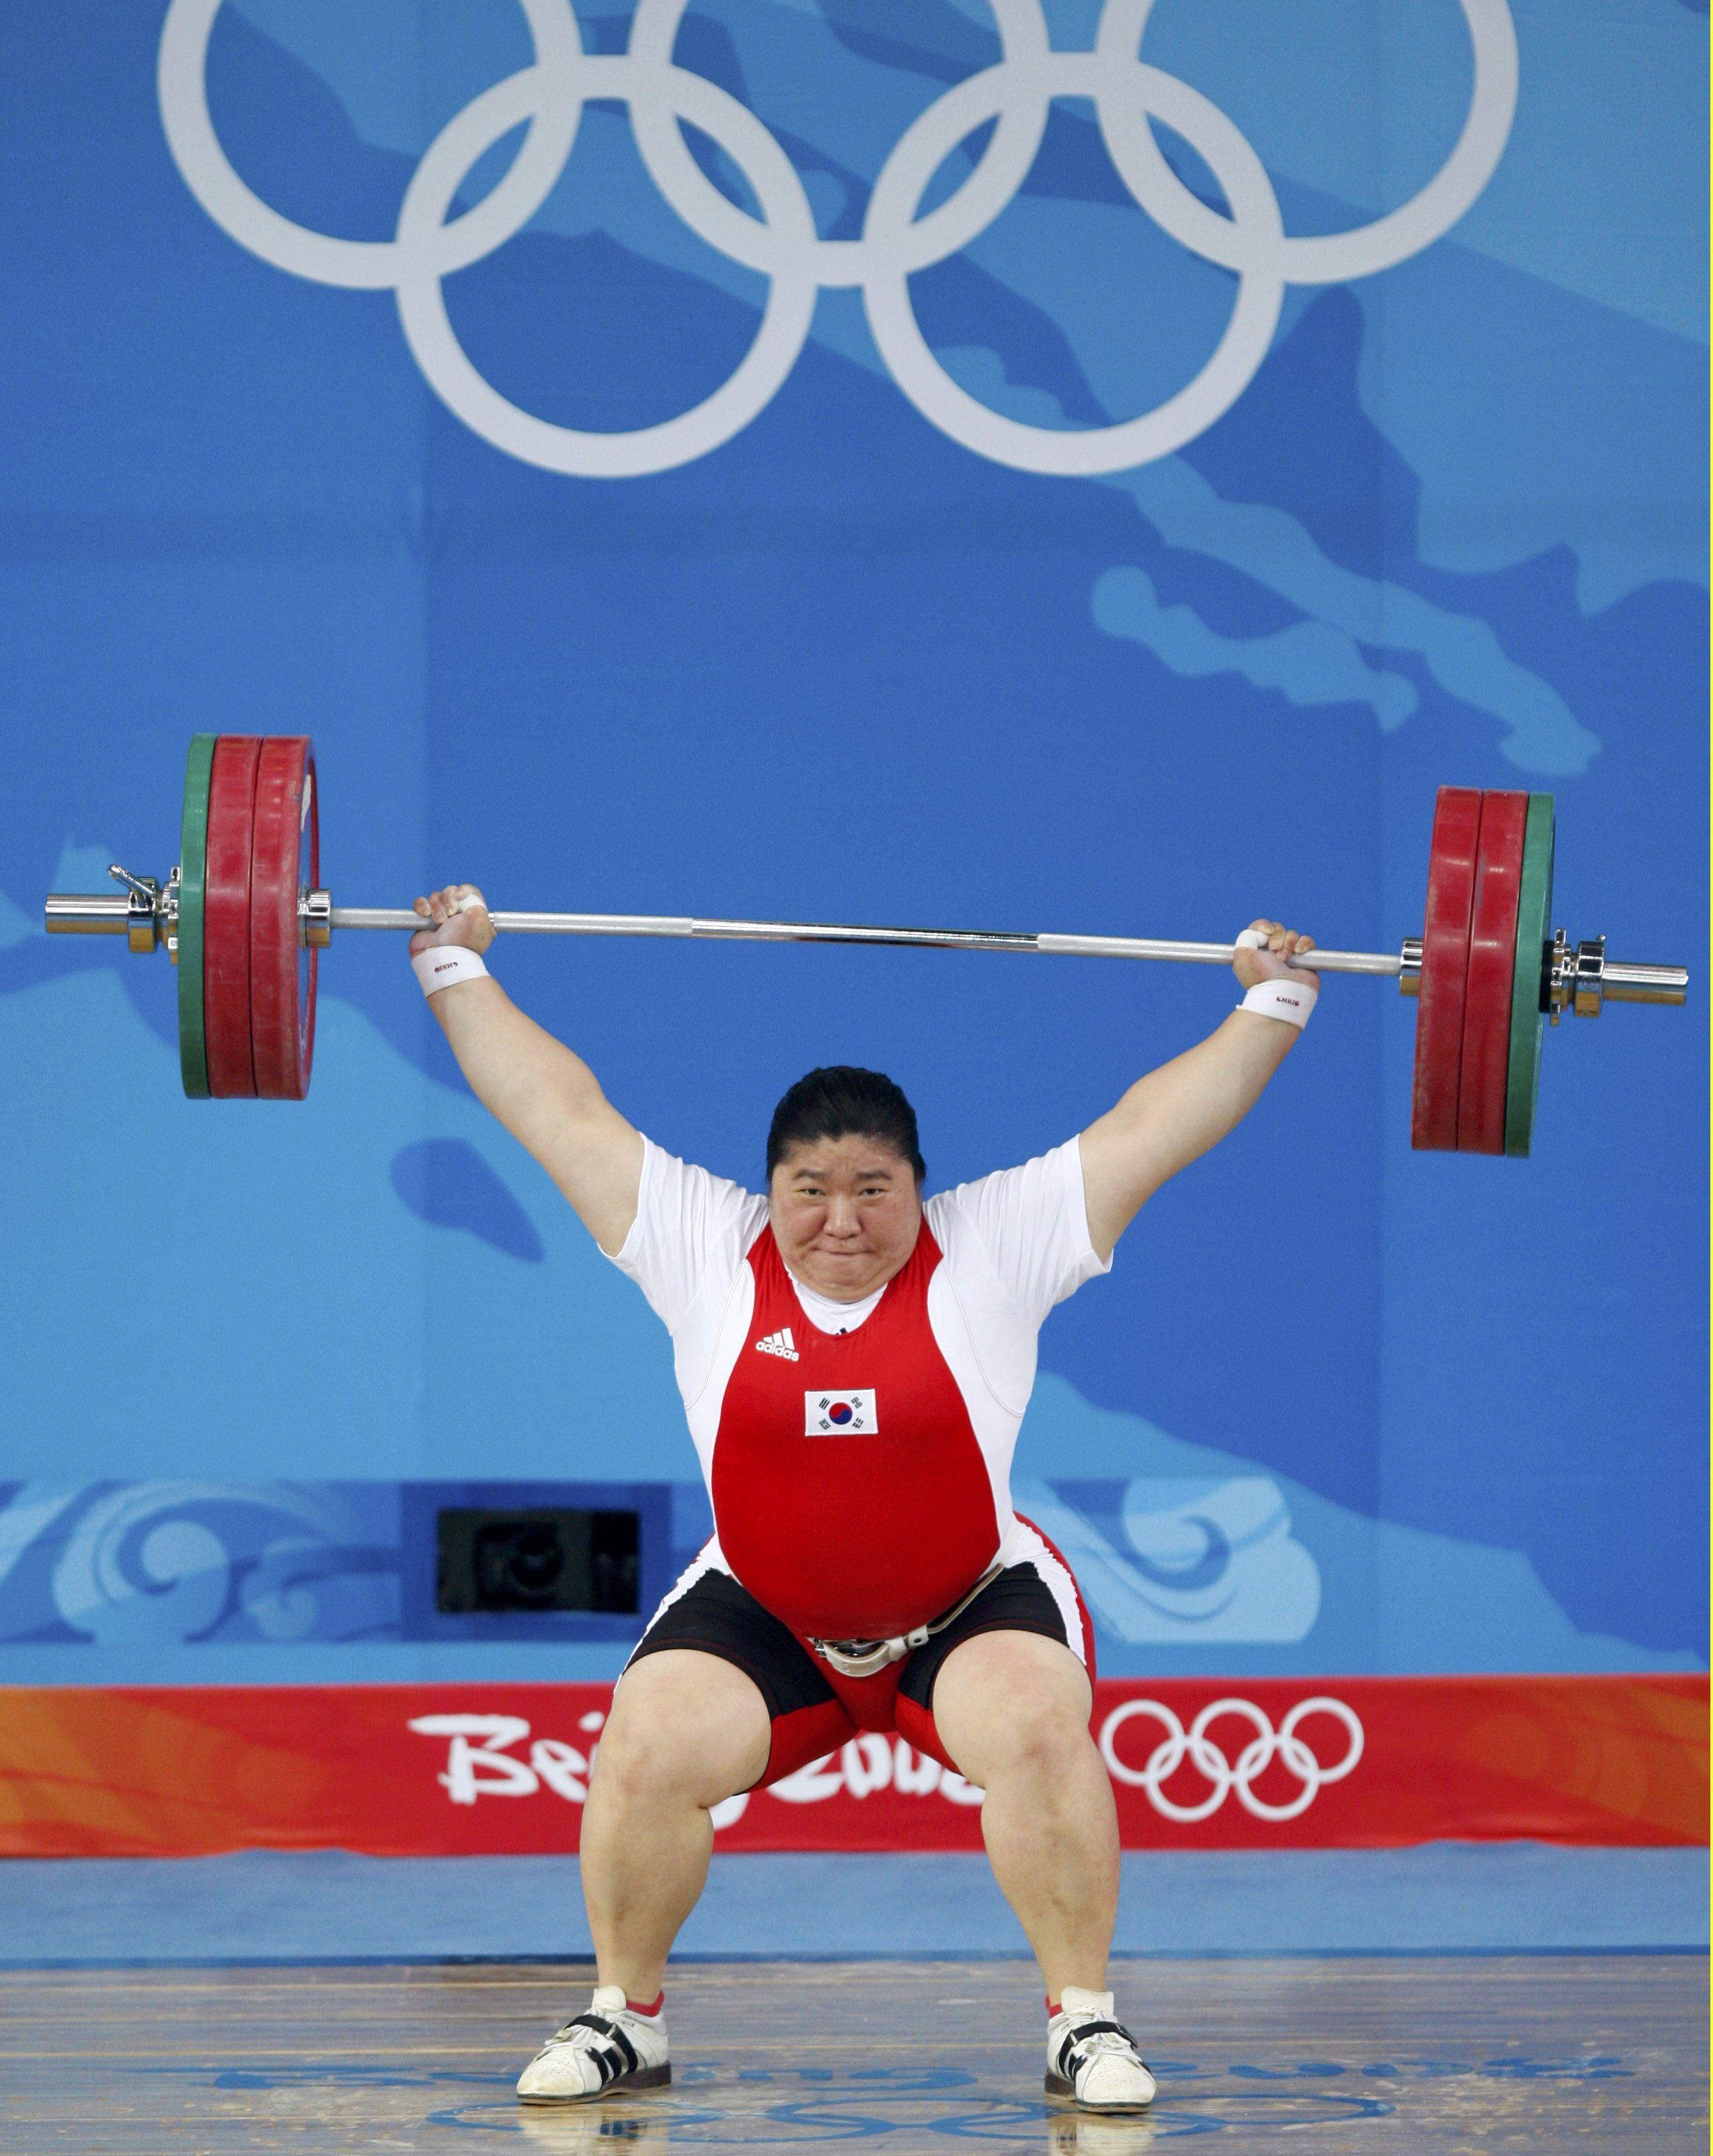 jasonjang_korean jang breaks world records, wins women\'s